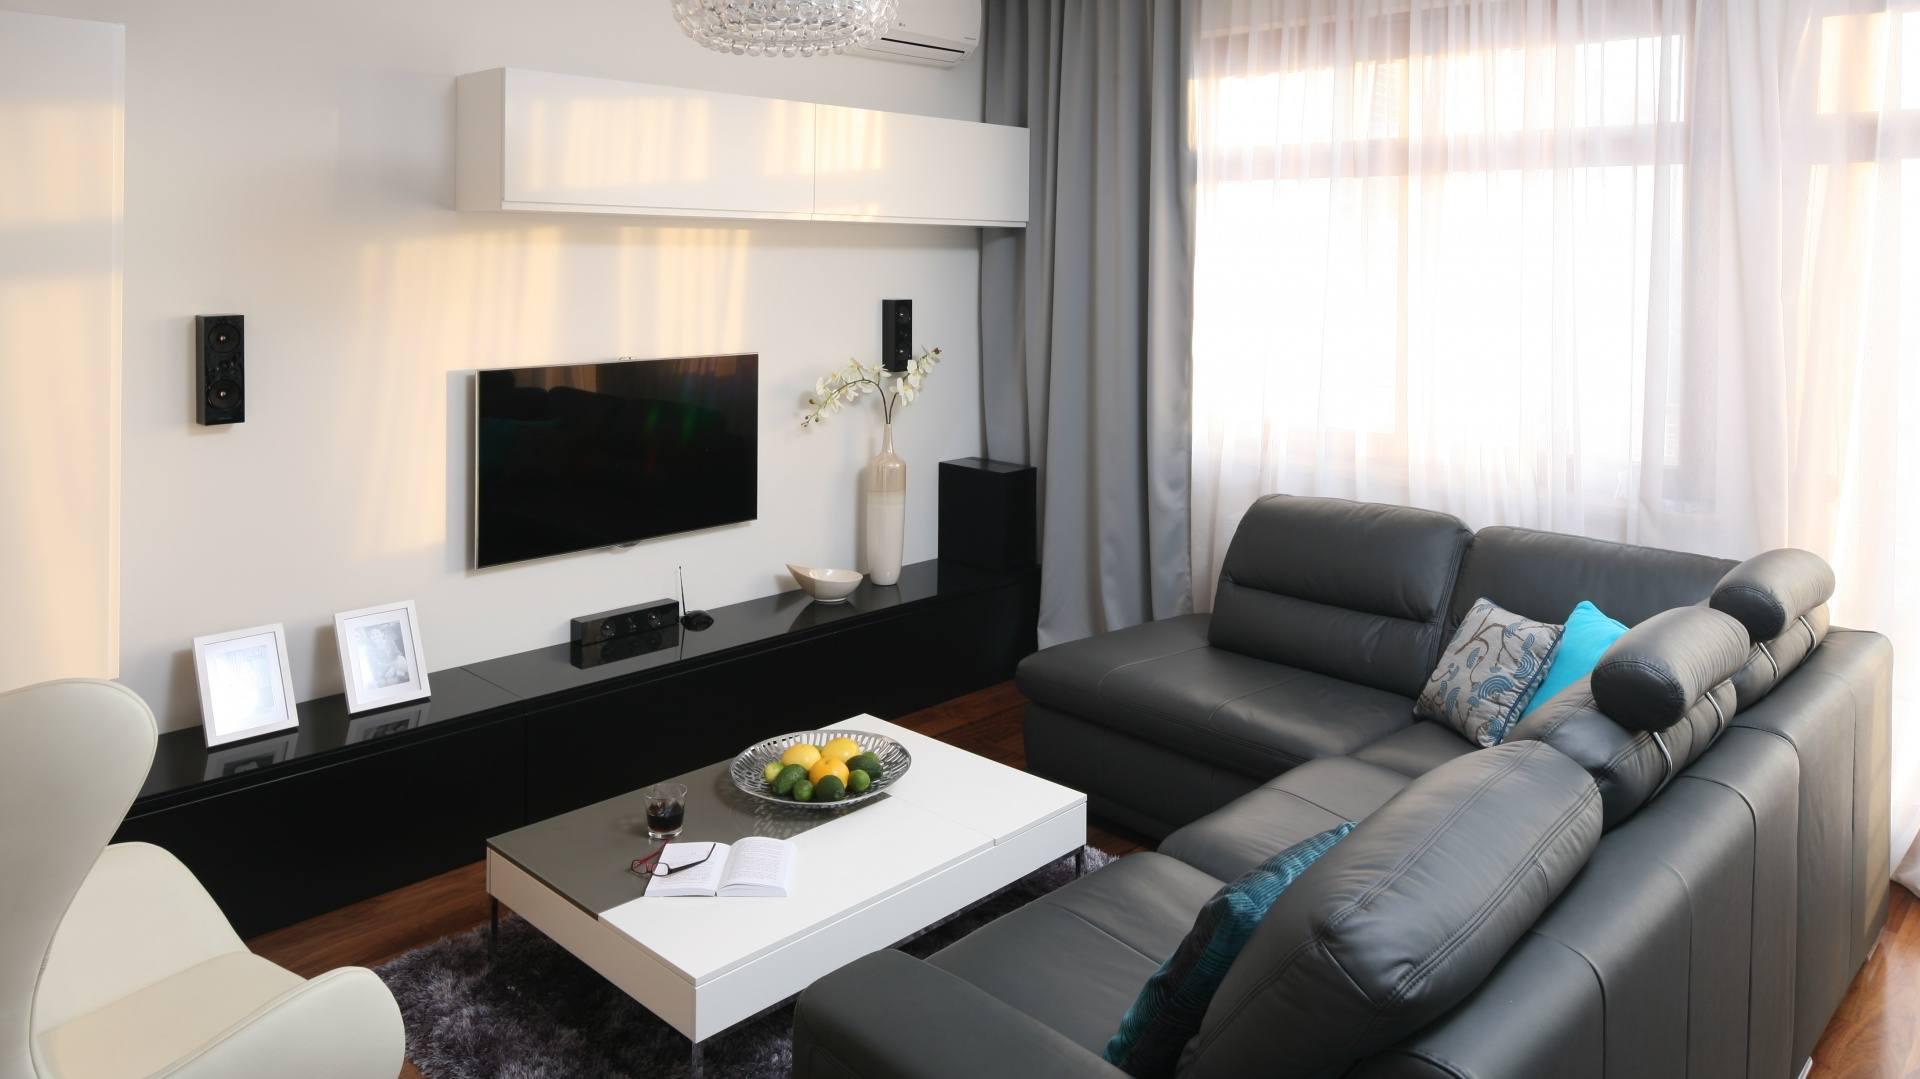 Modern designed living room with hovering shelves and TV-set